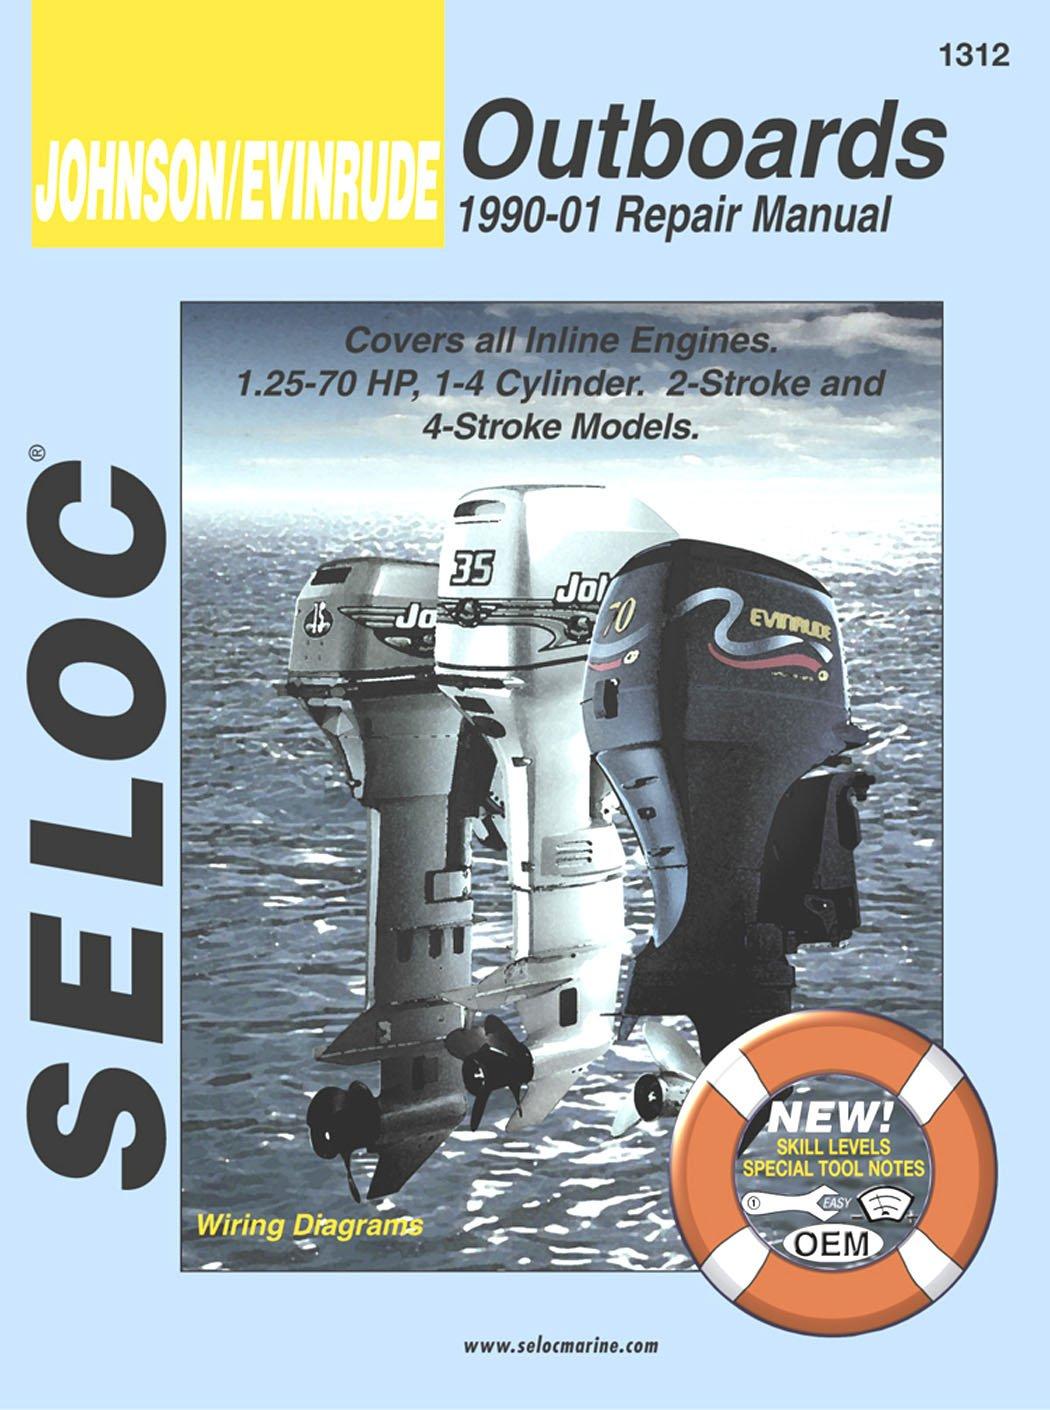 Amazon.com : Sierra International Seloc Manual 18-01312 Johnson/Evinrude  Outboards Repair 1990-2001 1.25-70 HP 1-4 Cylinder 2 Stroke & 4 Stroke  Model ...